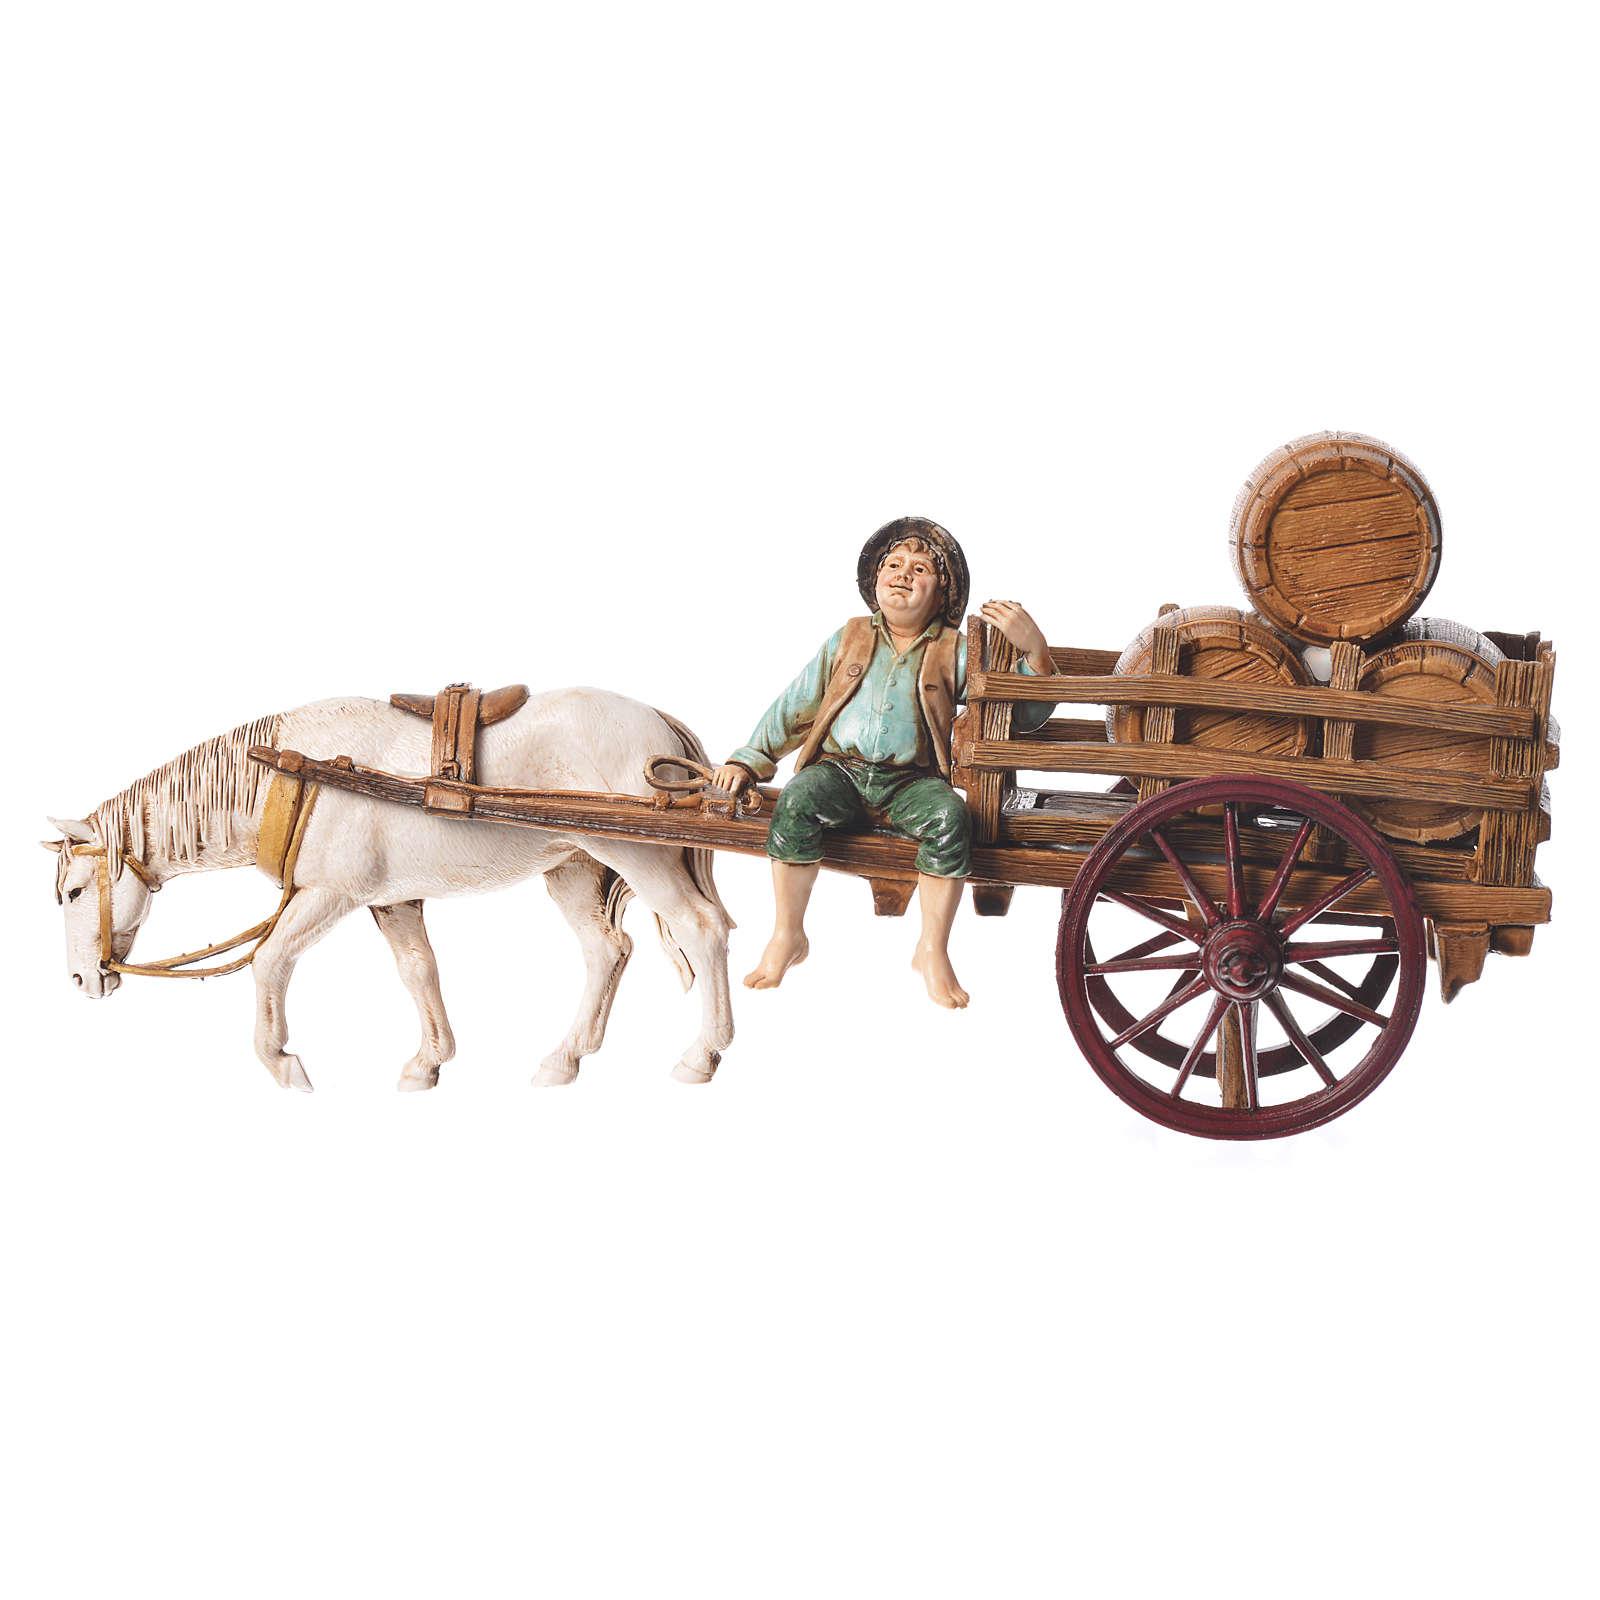 Man on cart 10cm 3 figurines, Moranduzzo nativity scene 4